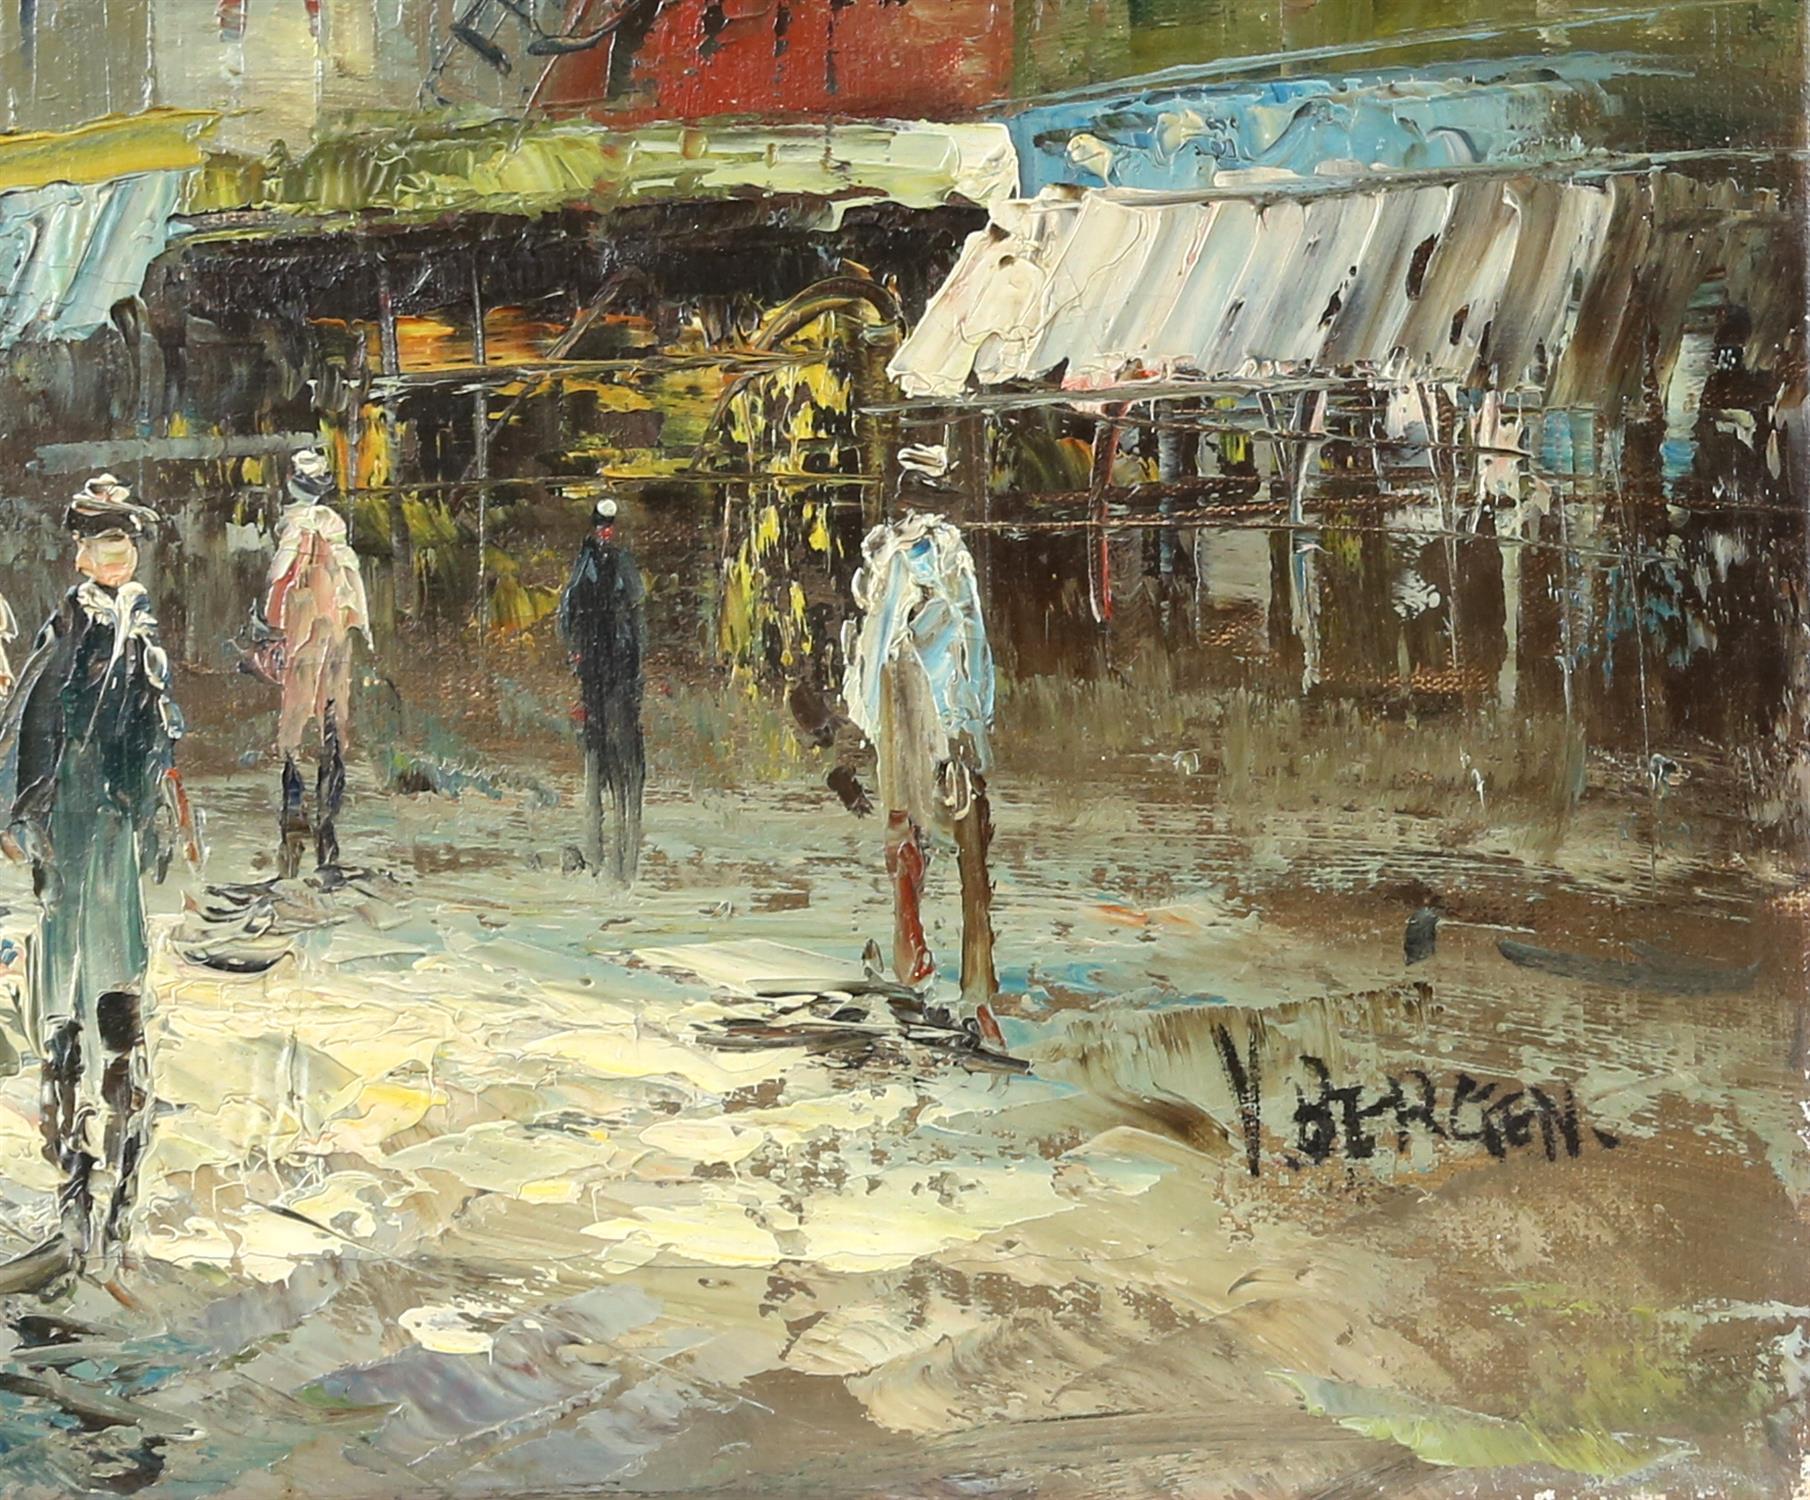 V. Bergen (20th century Continental school), Parisian street scene, oil on canvas, - Image 3 of 3